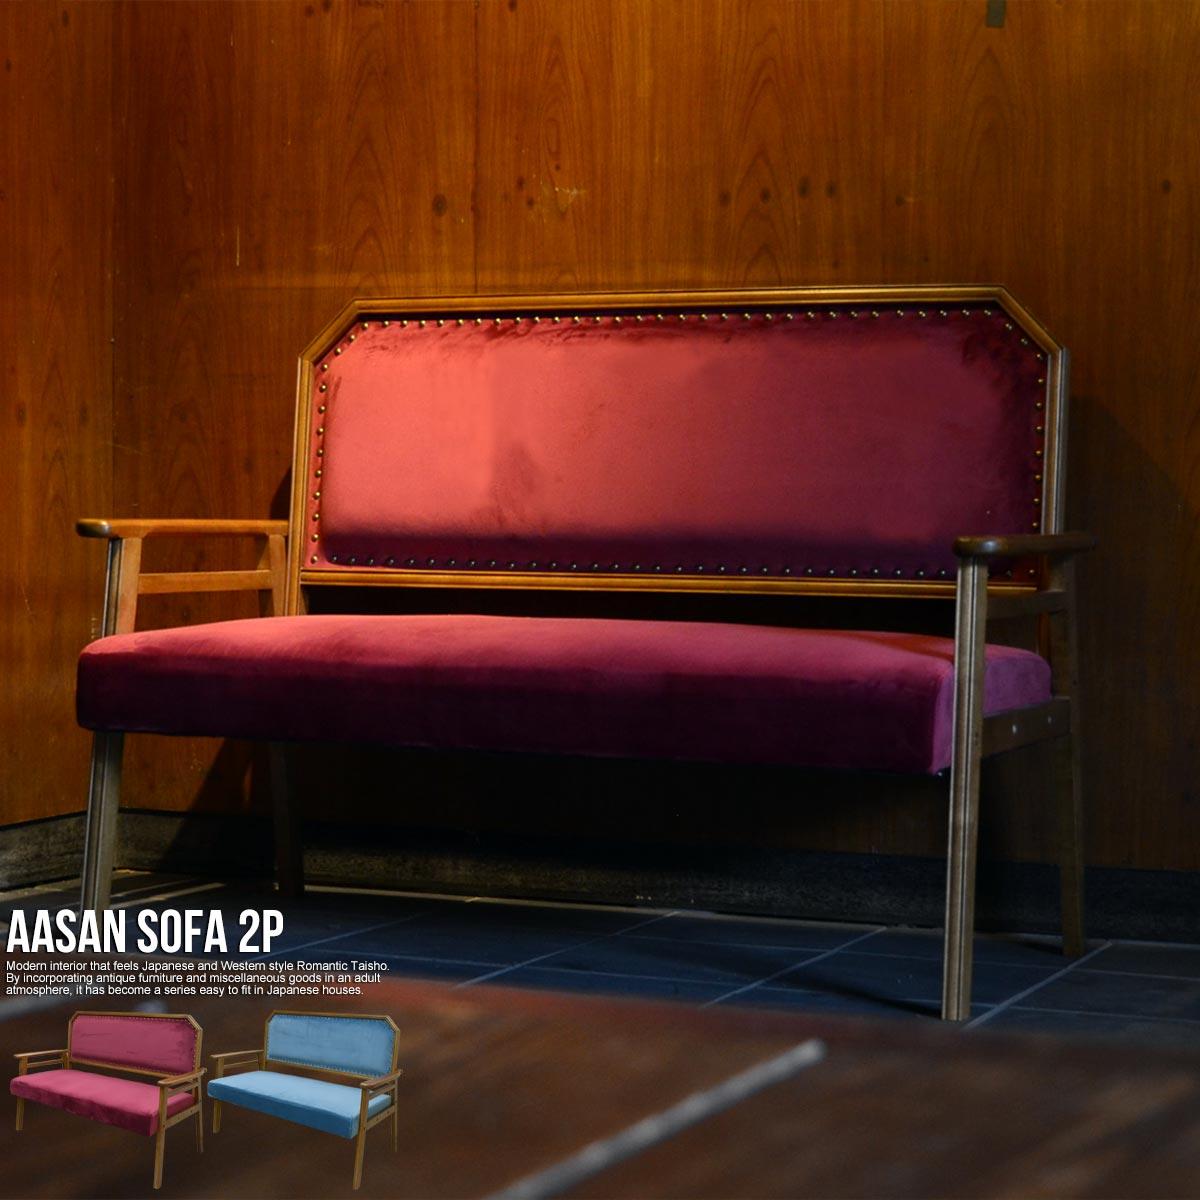 AASAN(アッサン) 2人掛けソファ ソファ 2P 2人掛けチェア 古民家風カフェ 畳部屋 洋室 和室 SOFA アンティーク風